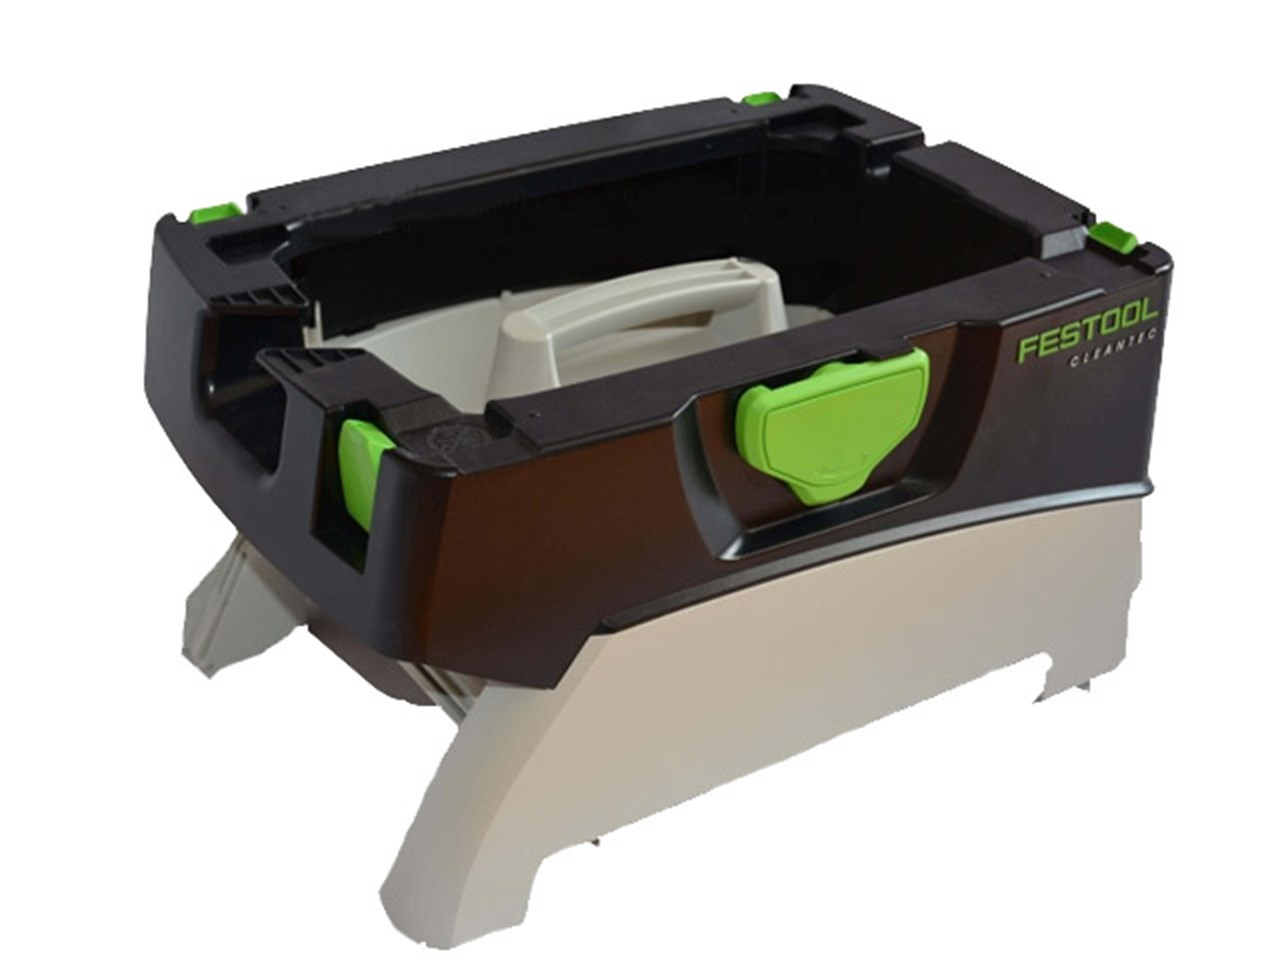 Festool 499748 Housing For Ctl Mini Midi Dust Extractor